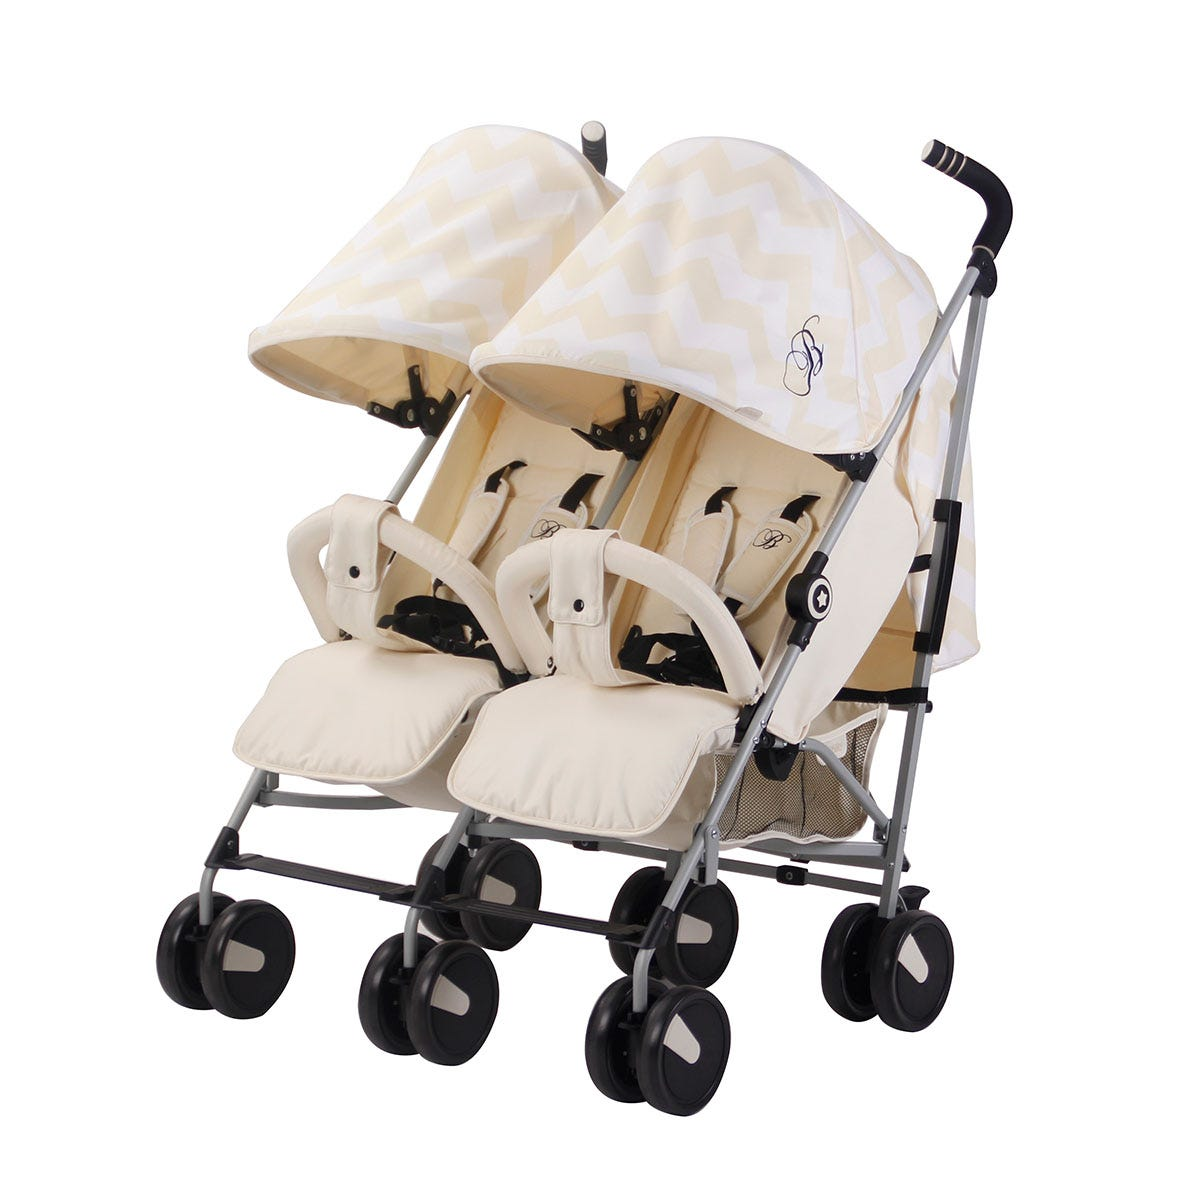 My Babiie Billie Faiers MB22 Chevron Twin Stroller - Cream